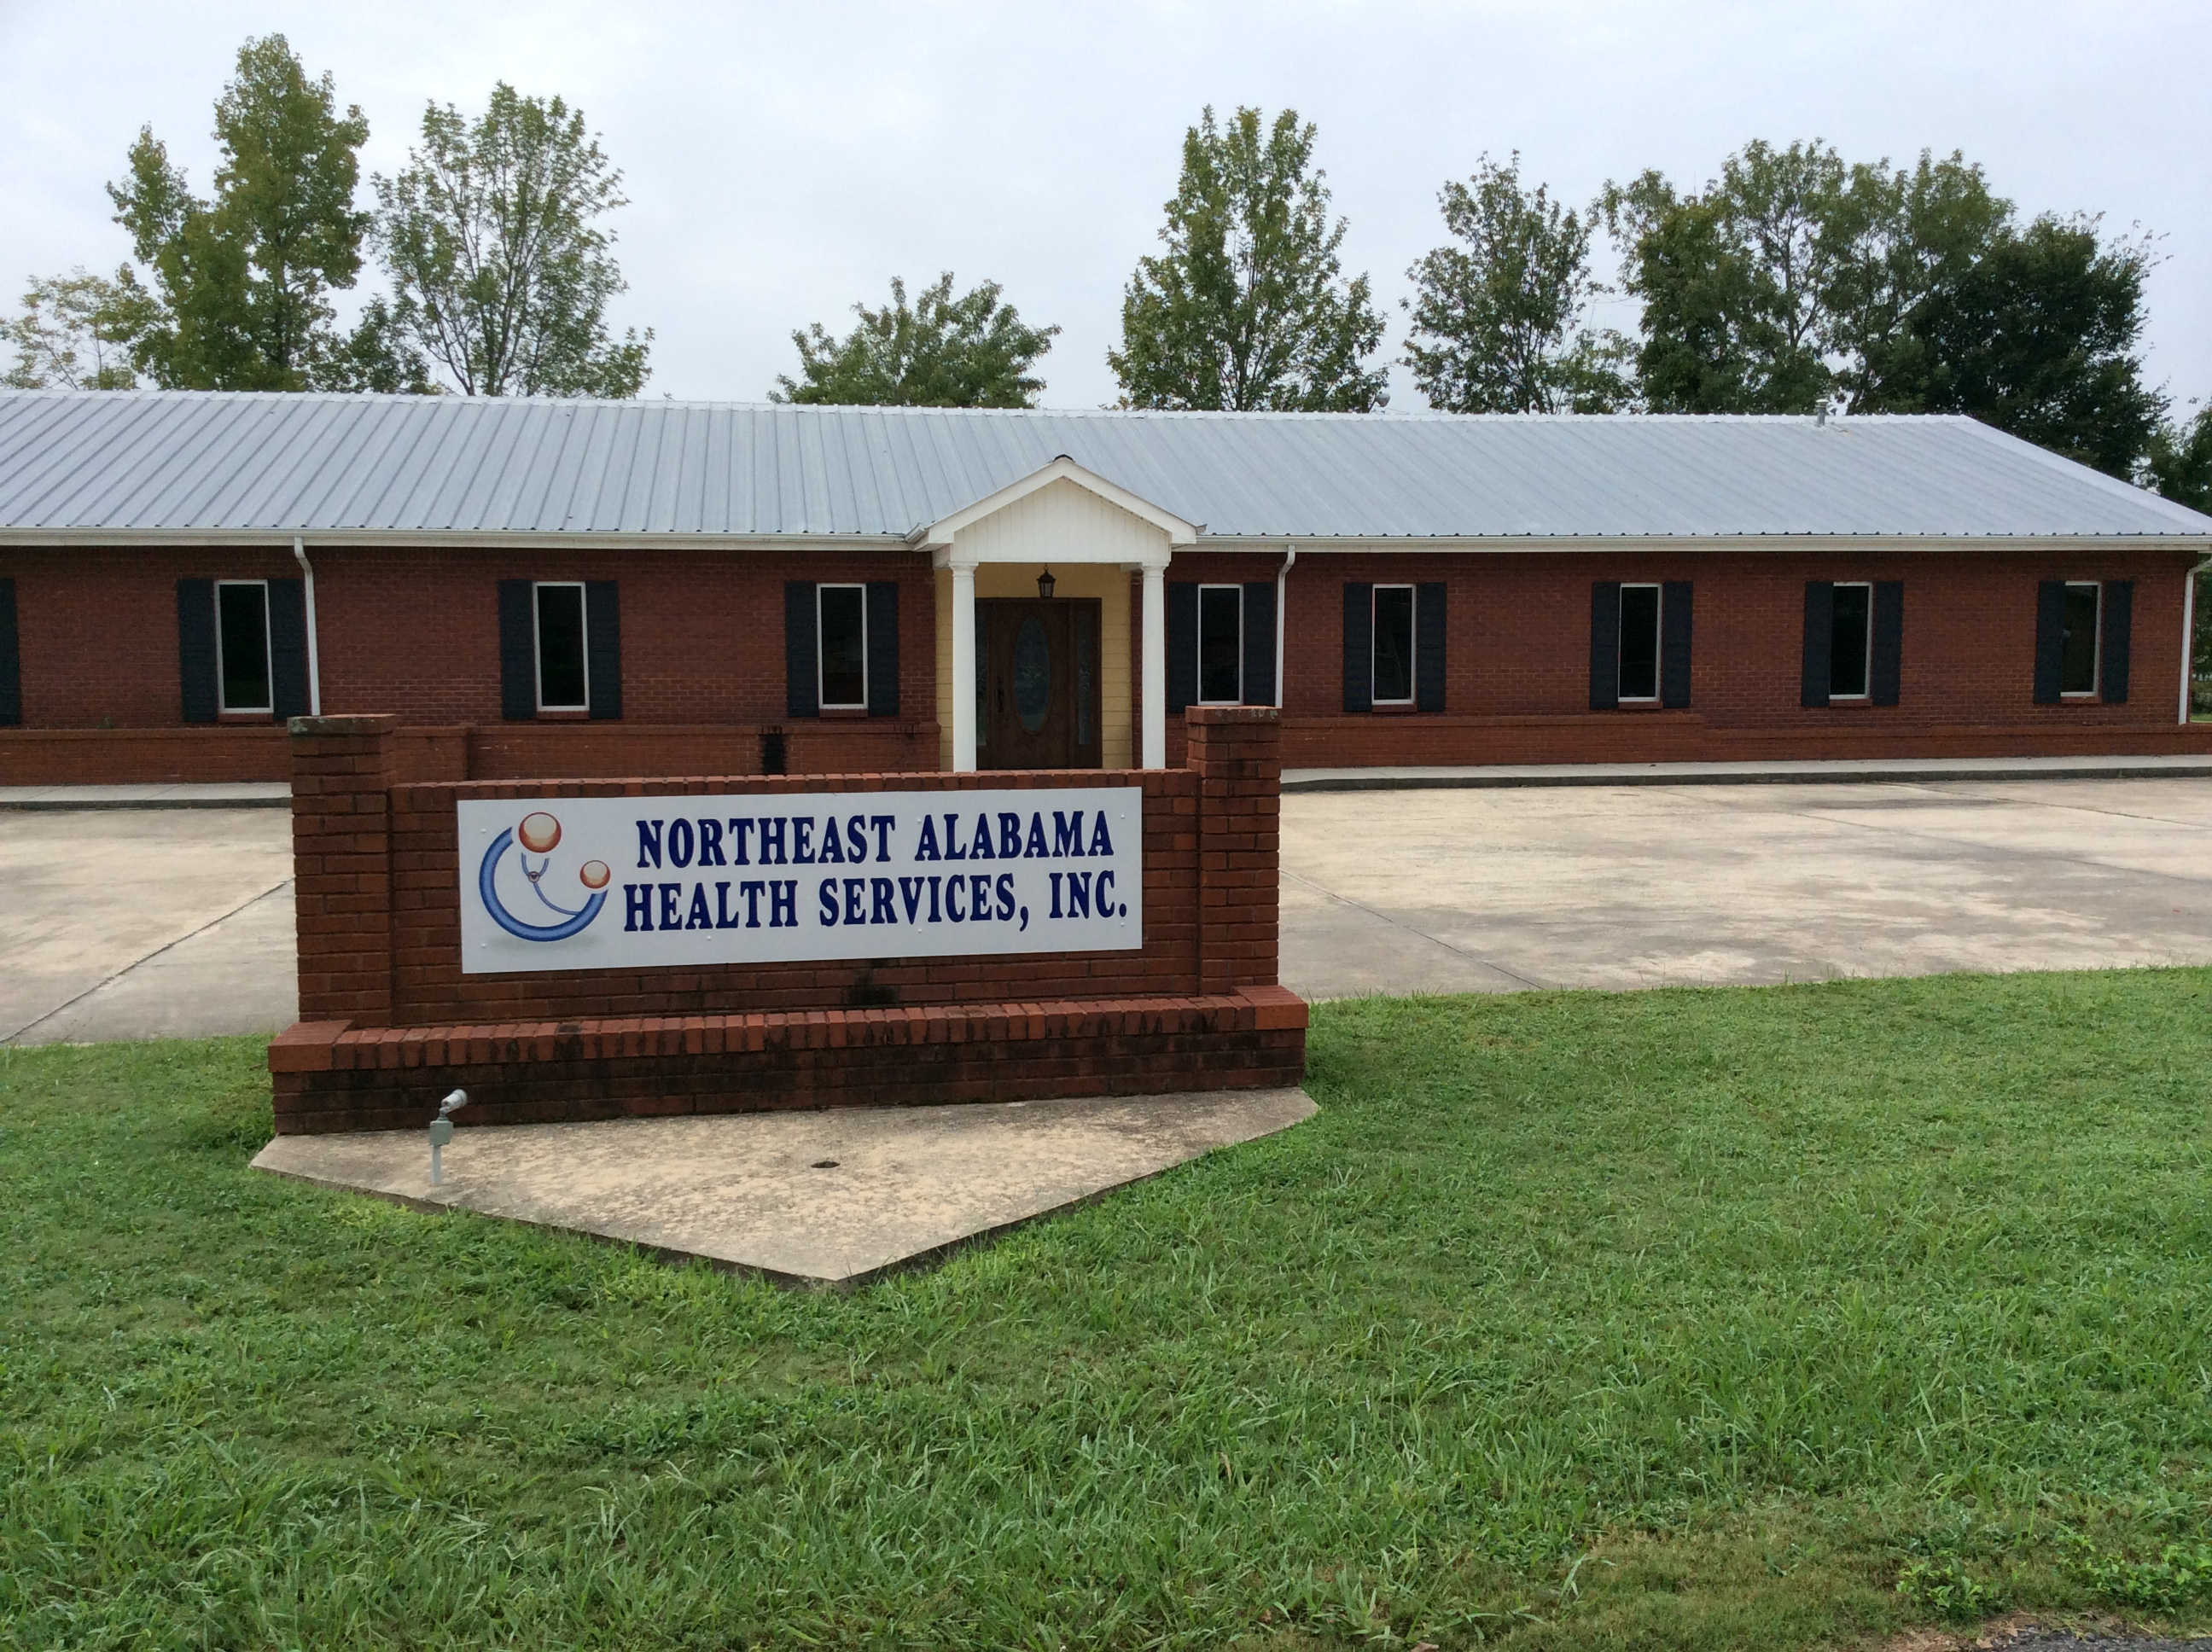 Northeast Alabama Health Services, Inc.